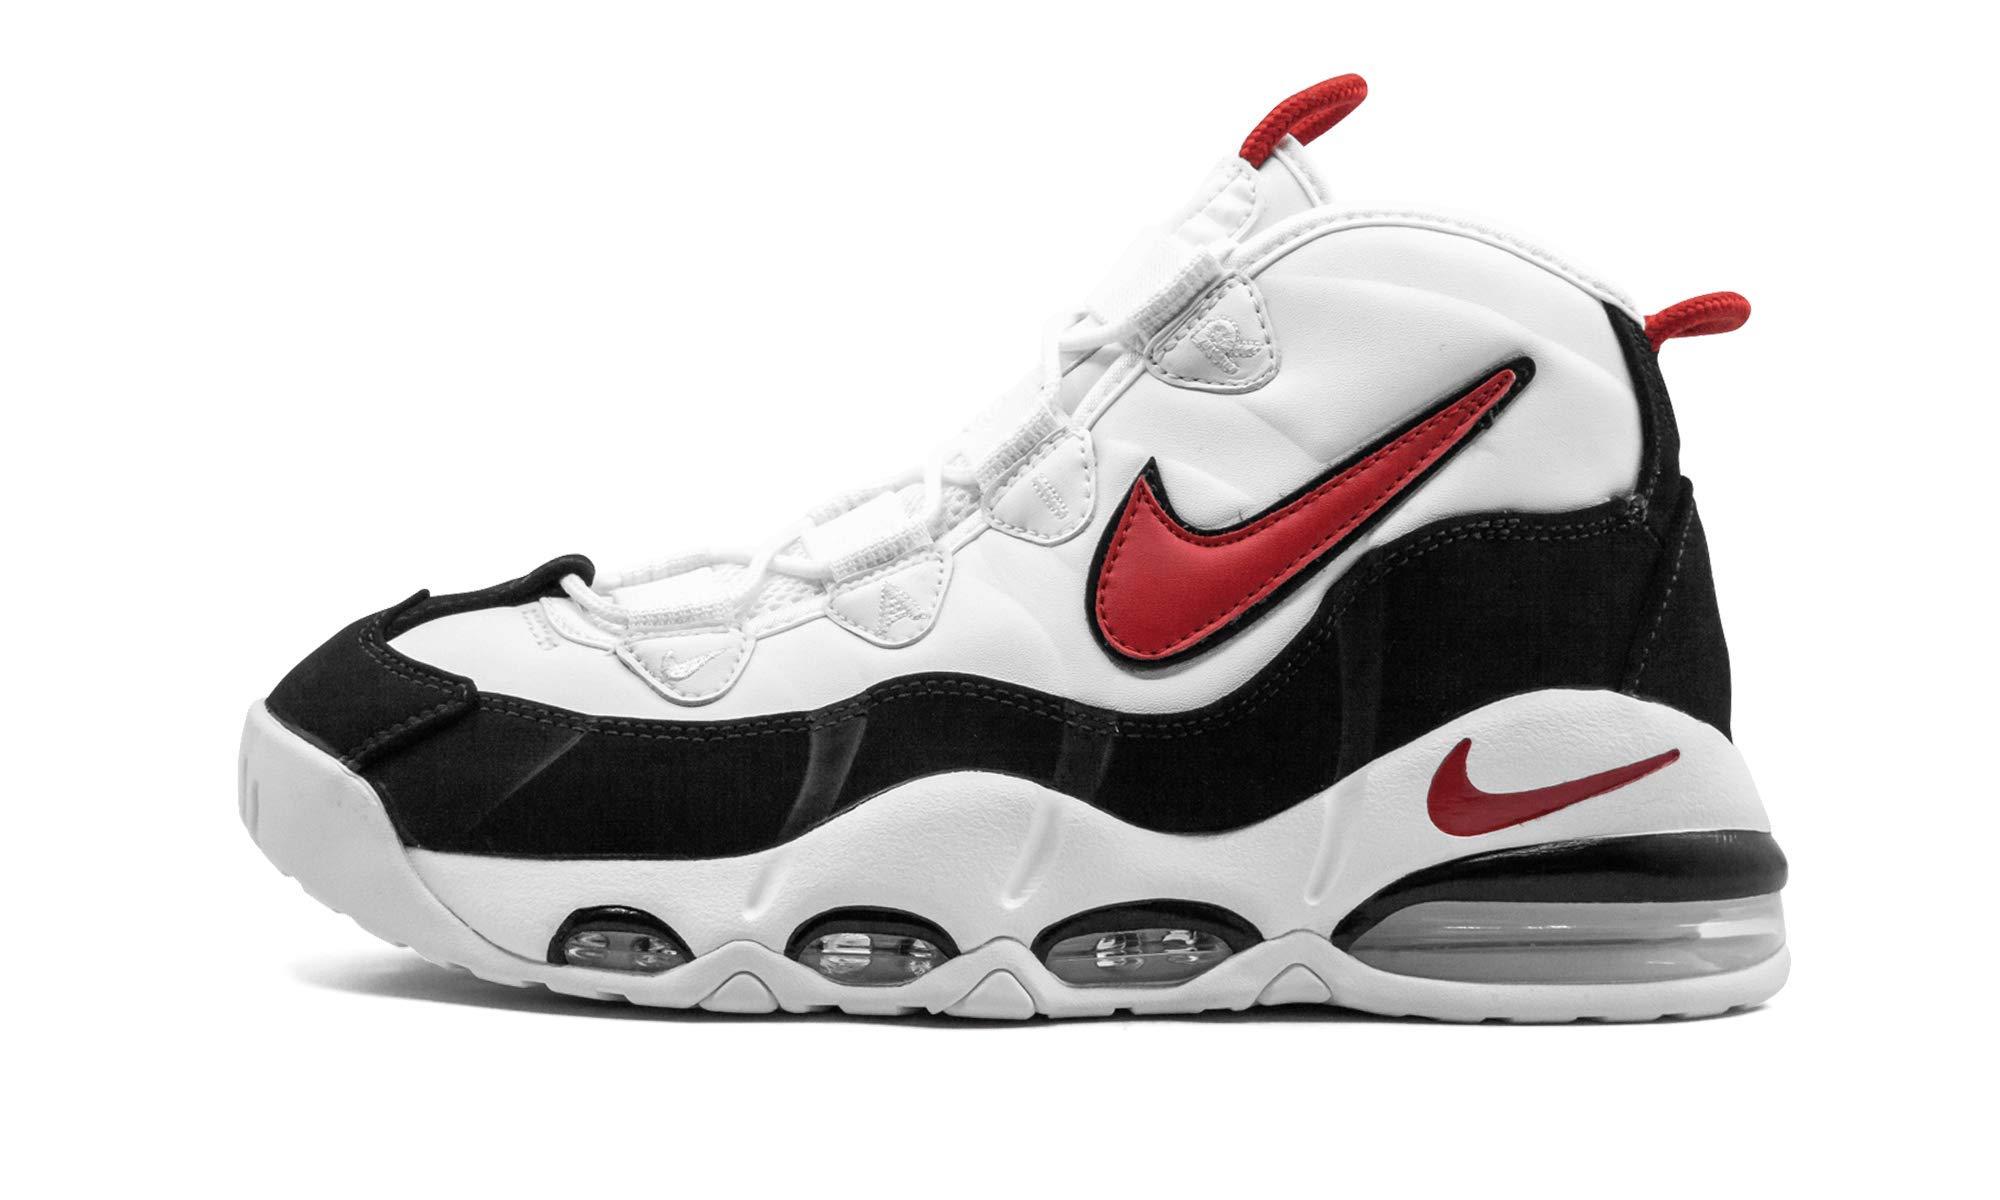 Nike Men's Air Max Uptempo '95 CK0892